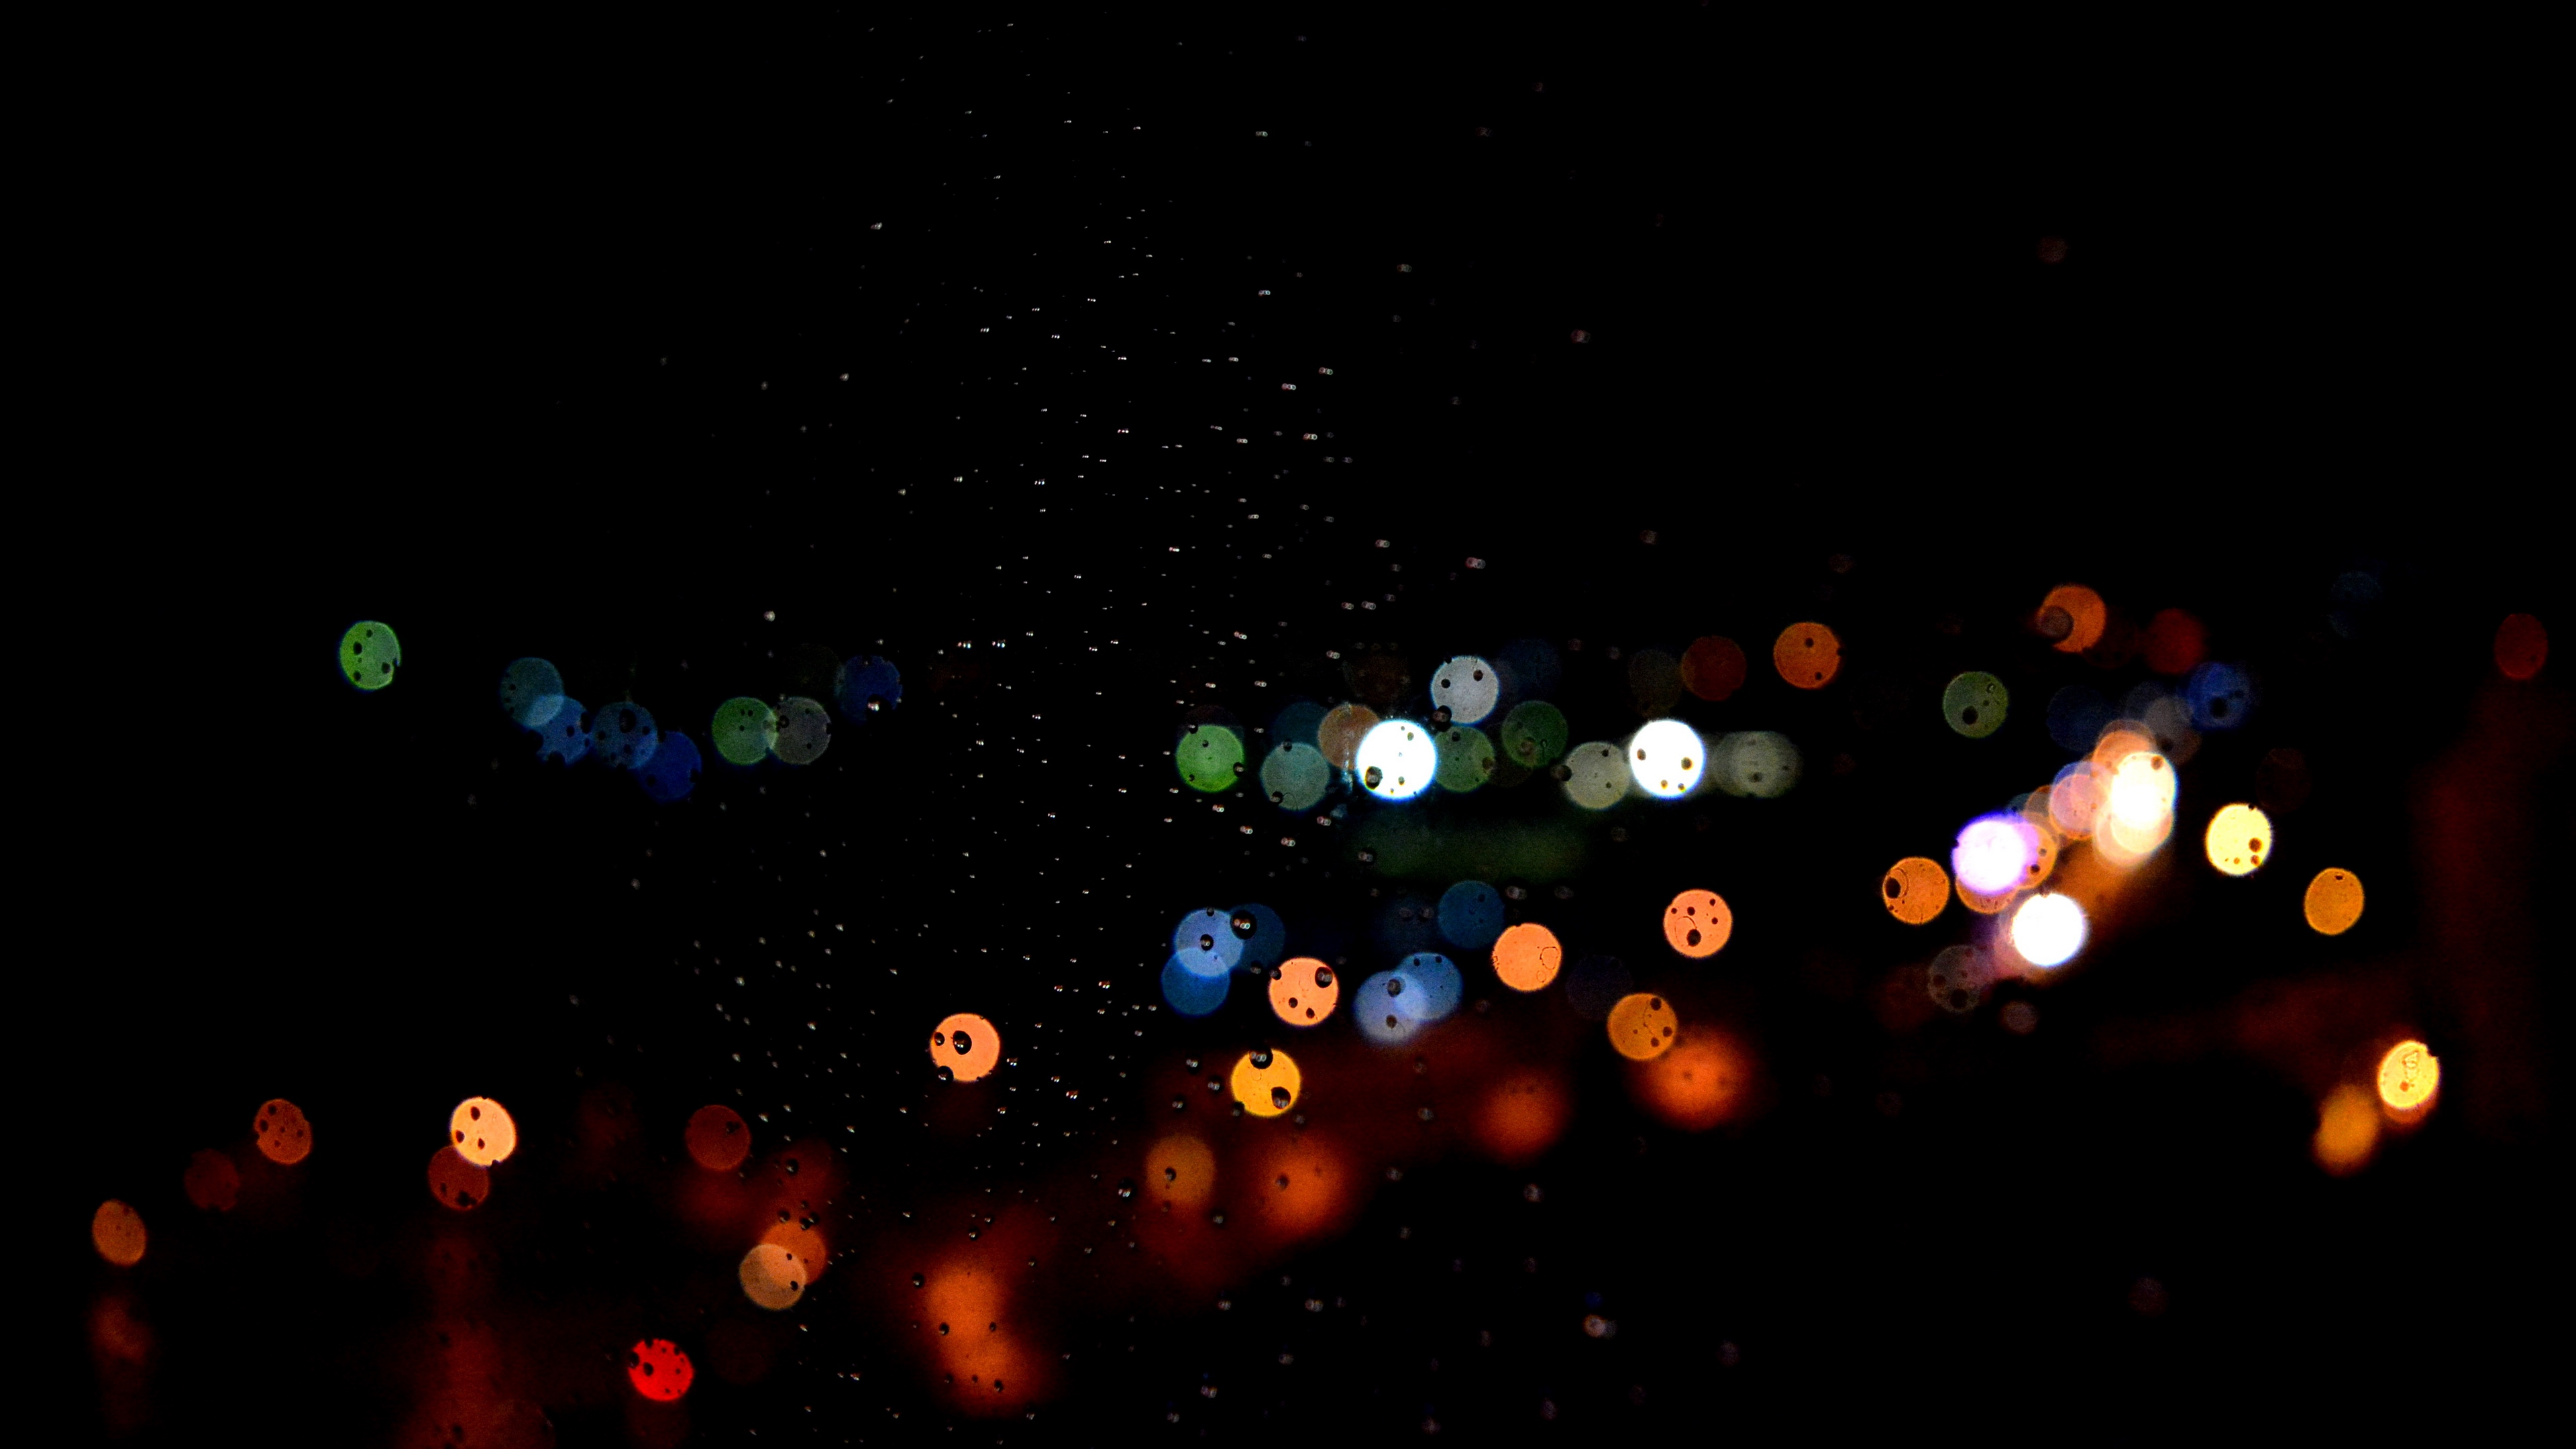 glare dark background drops circles 4k 1539369392 - glare, dark background, drops, circles 4k - glare, Drops, dark background